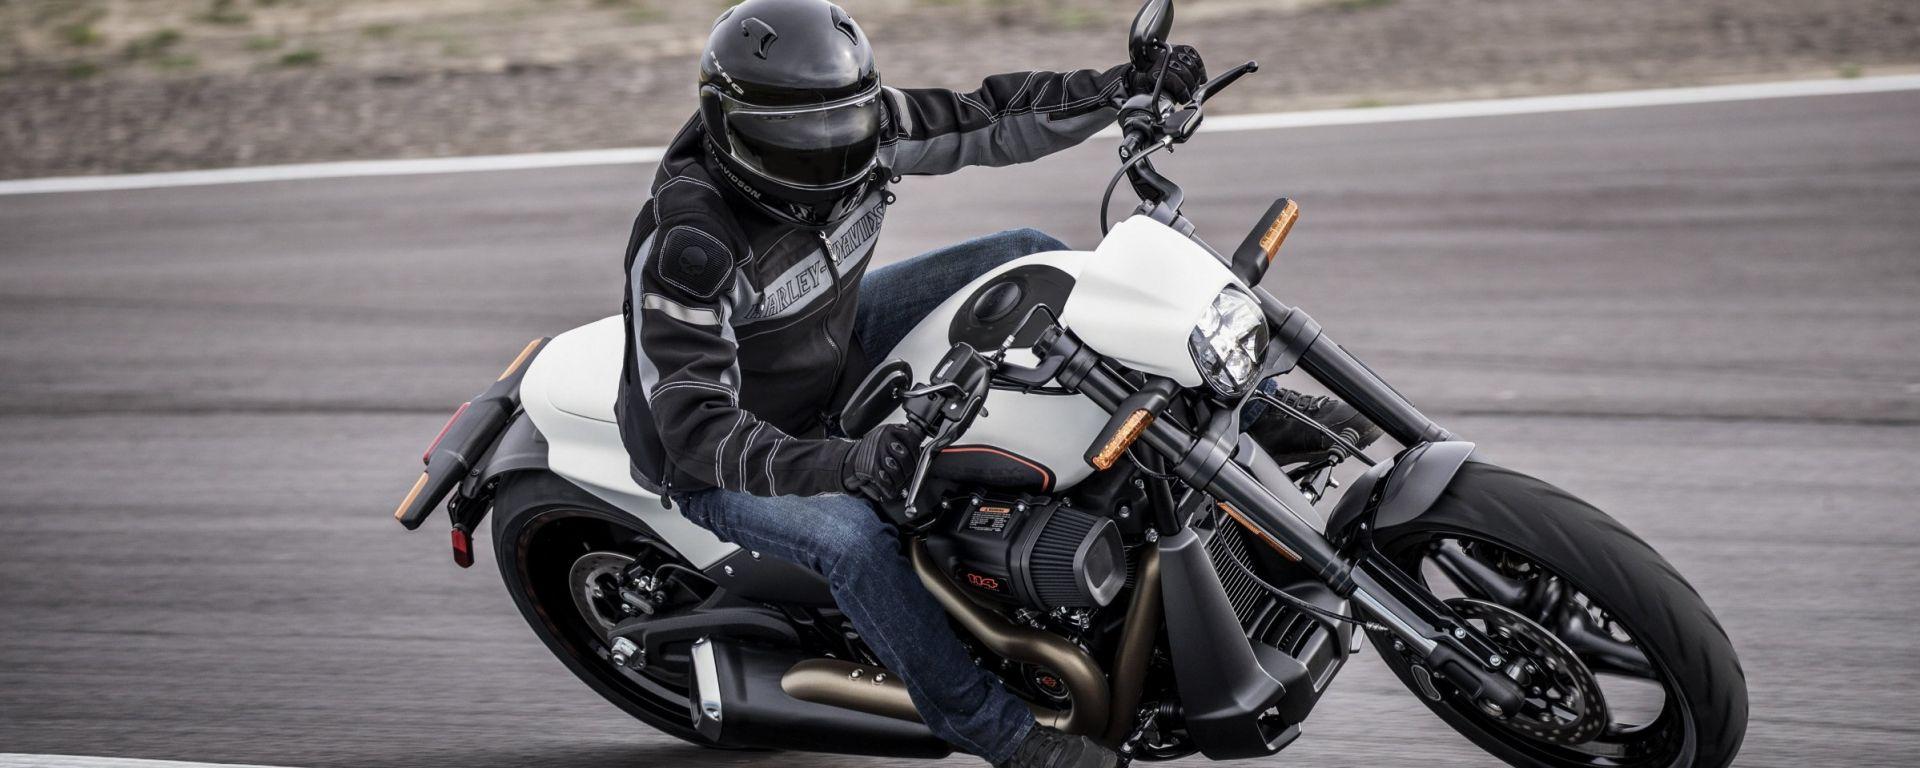 Nuova Harley Davidson FXDR 114